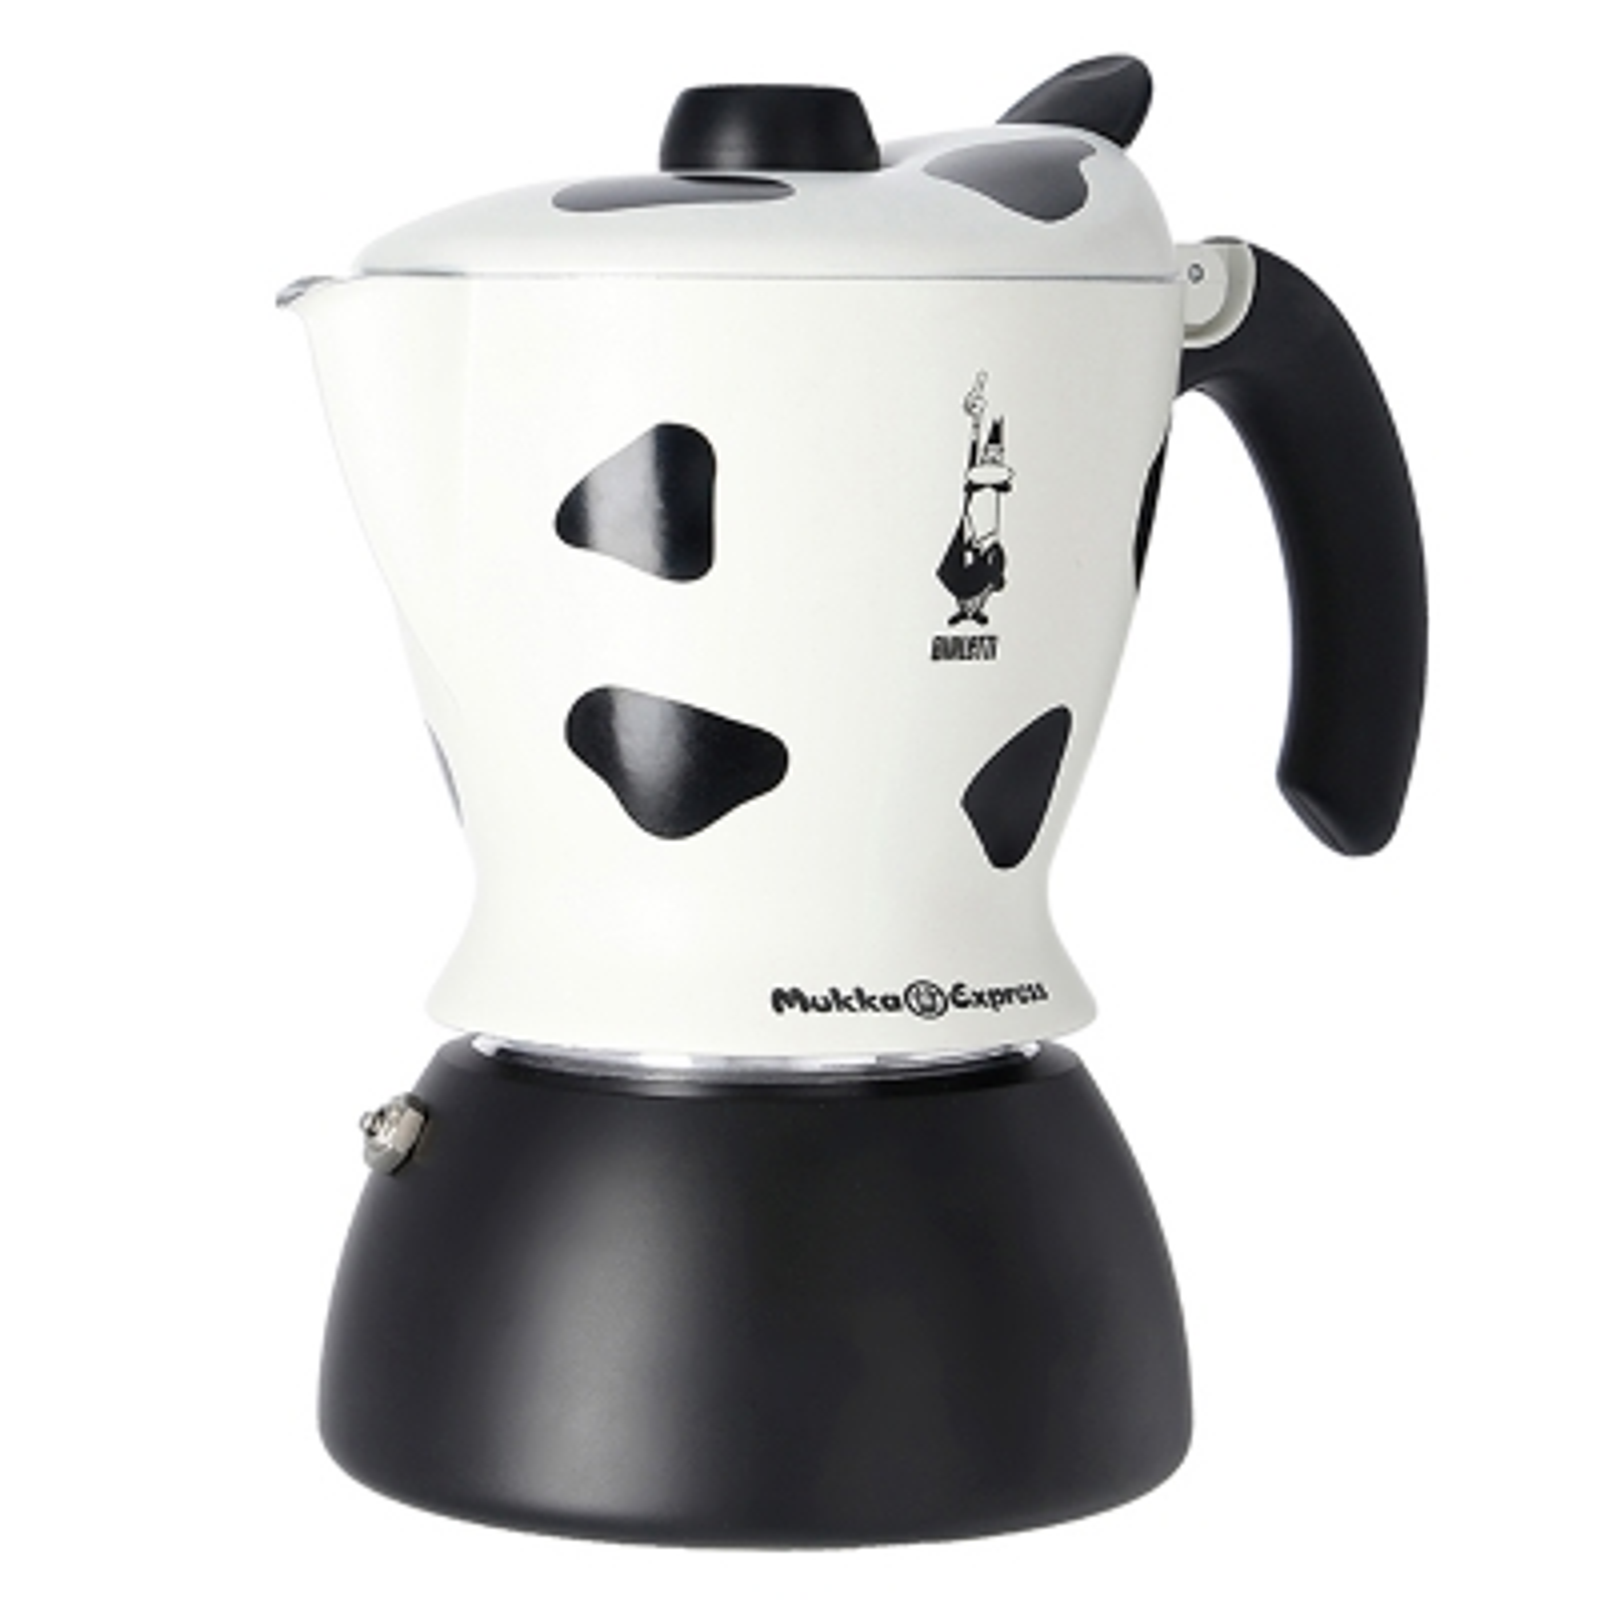 Bialetti Mukka Cafetera Blanco y Negro 2 Tazas